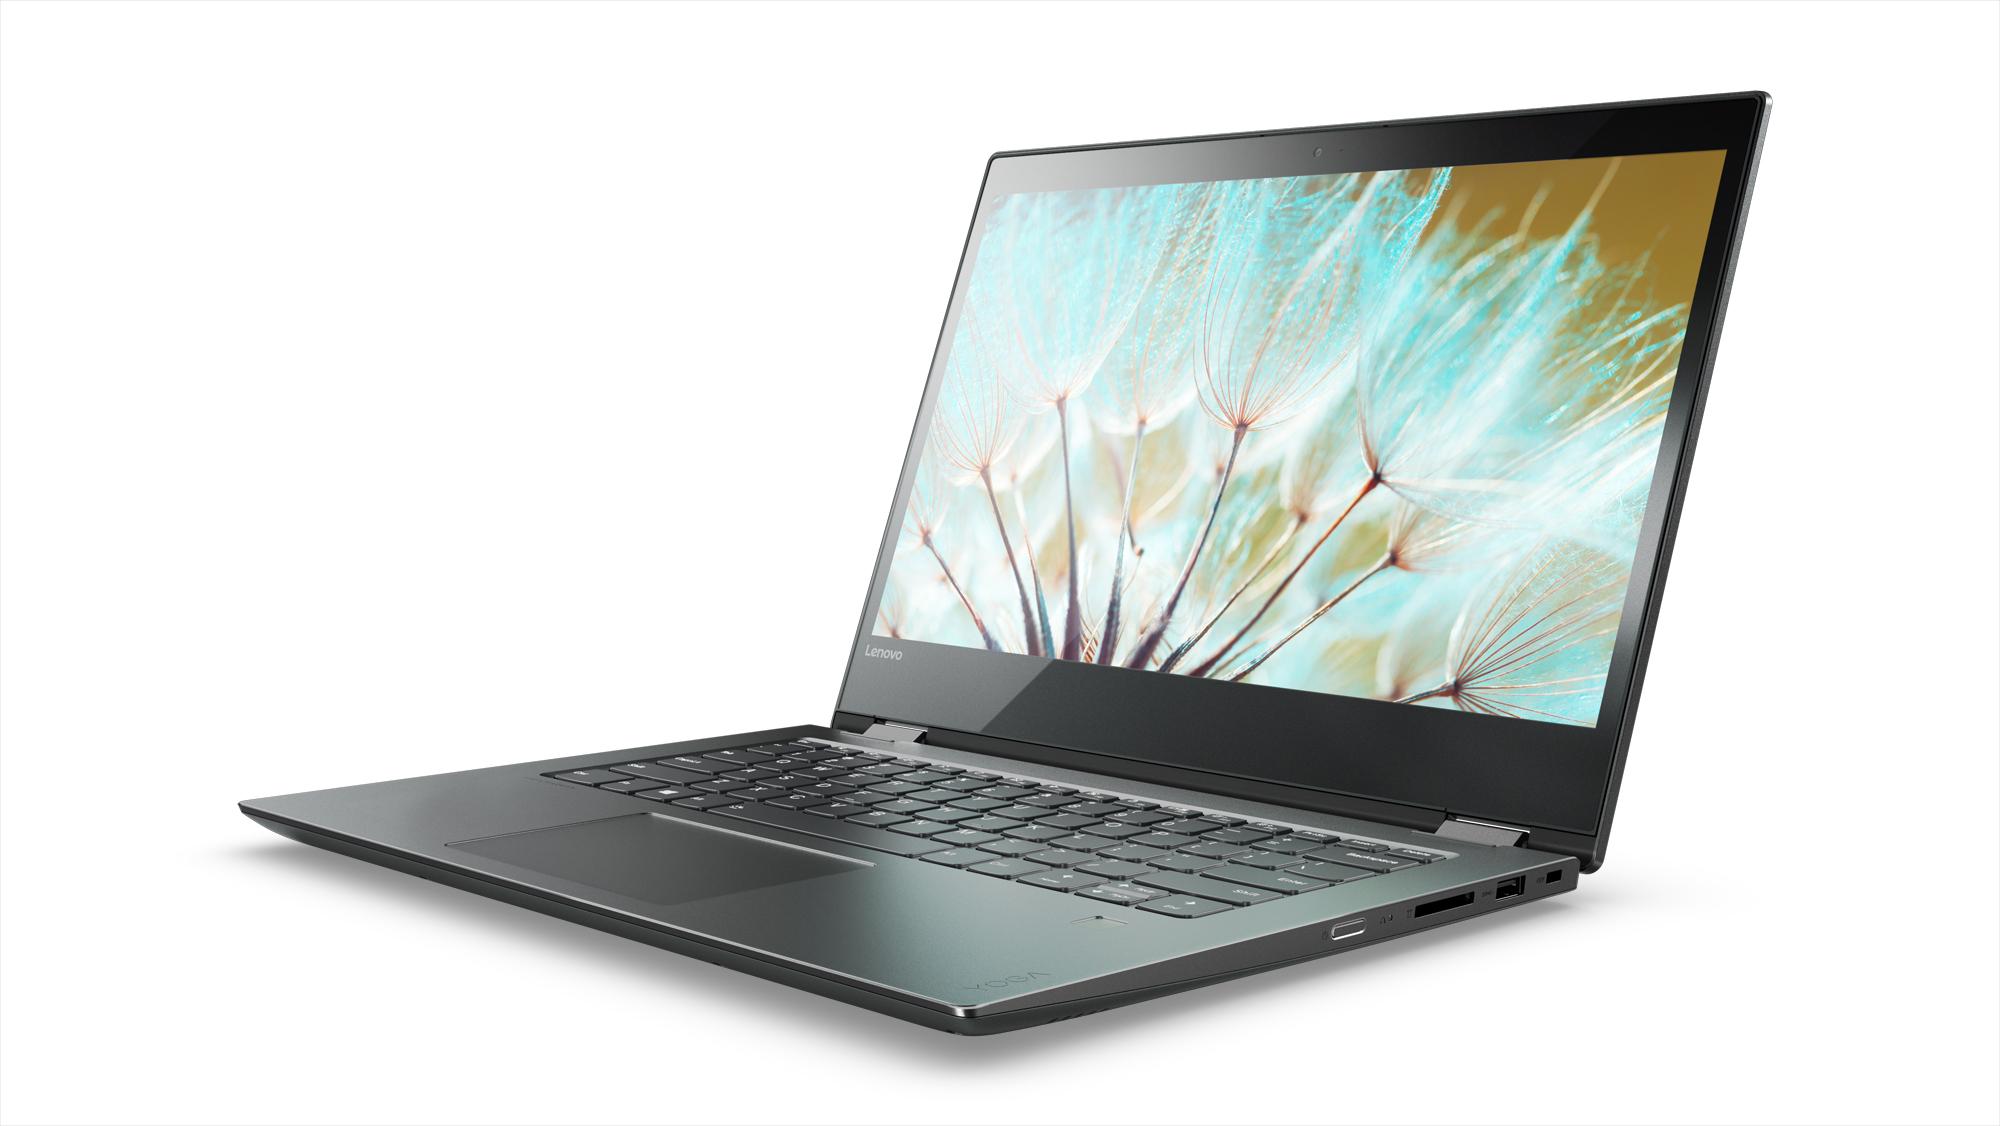 Фото  Ультрабук Lenovo YOGA 520  Onyx Black (81C800FBRA)